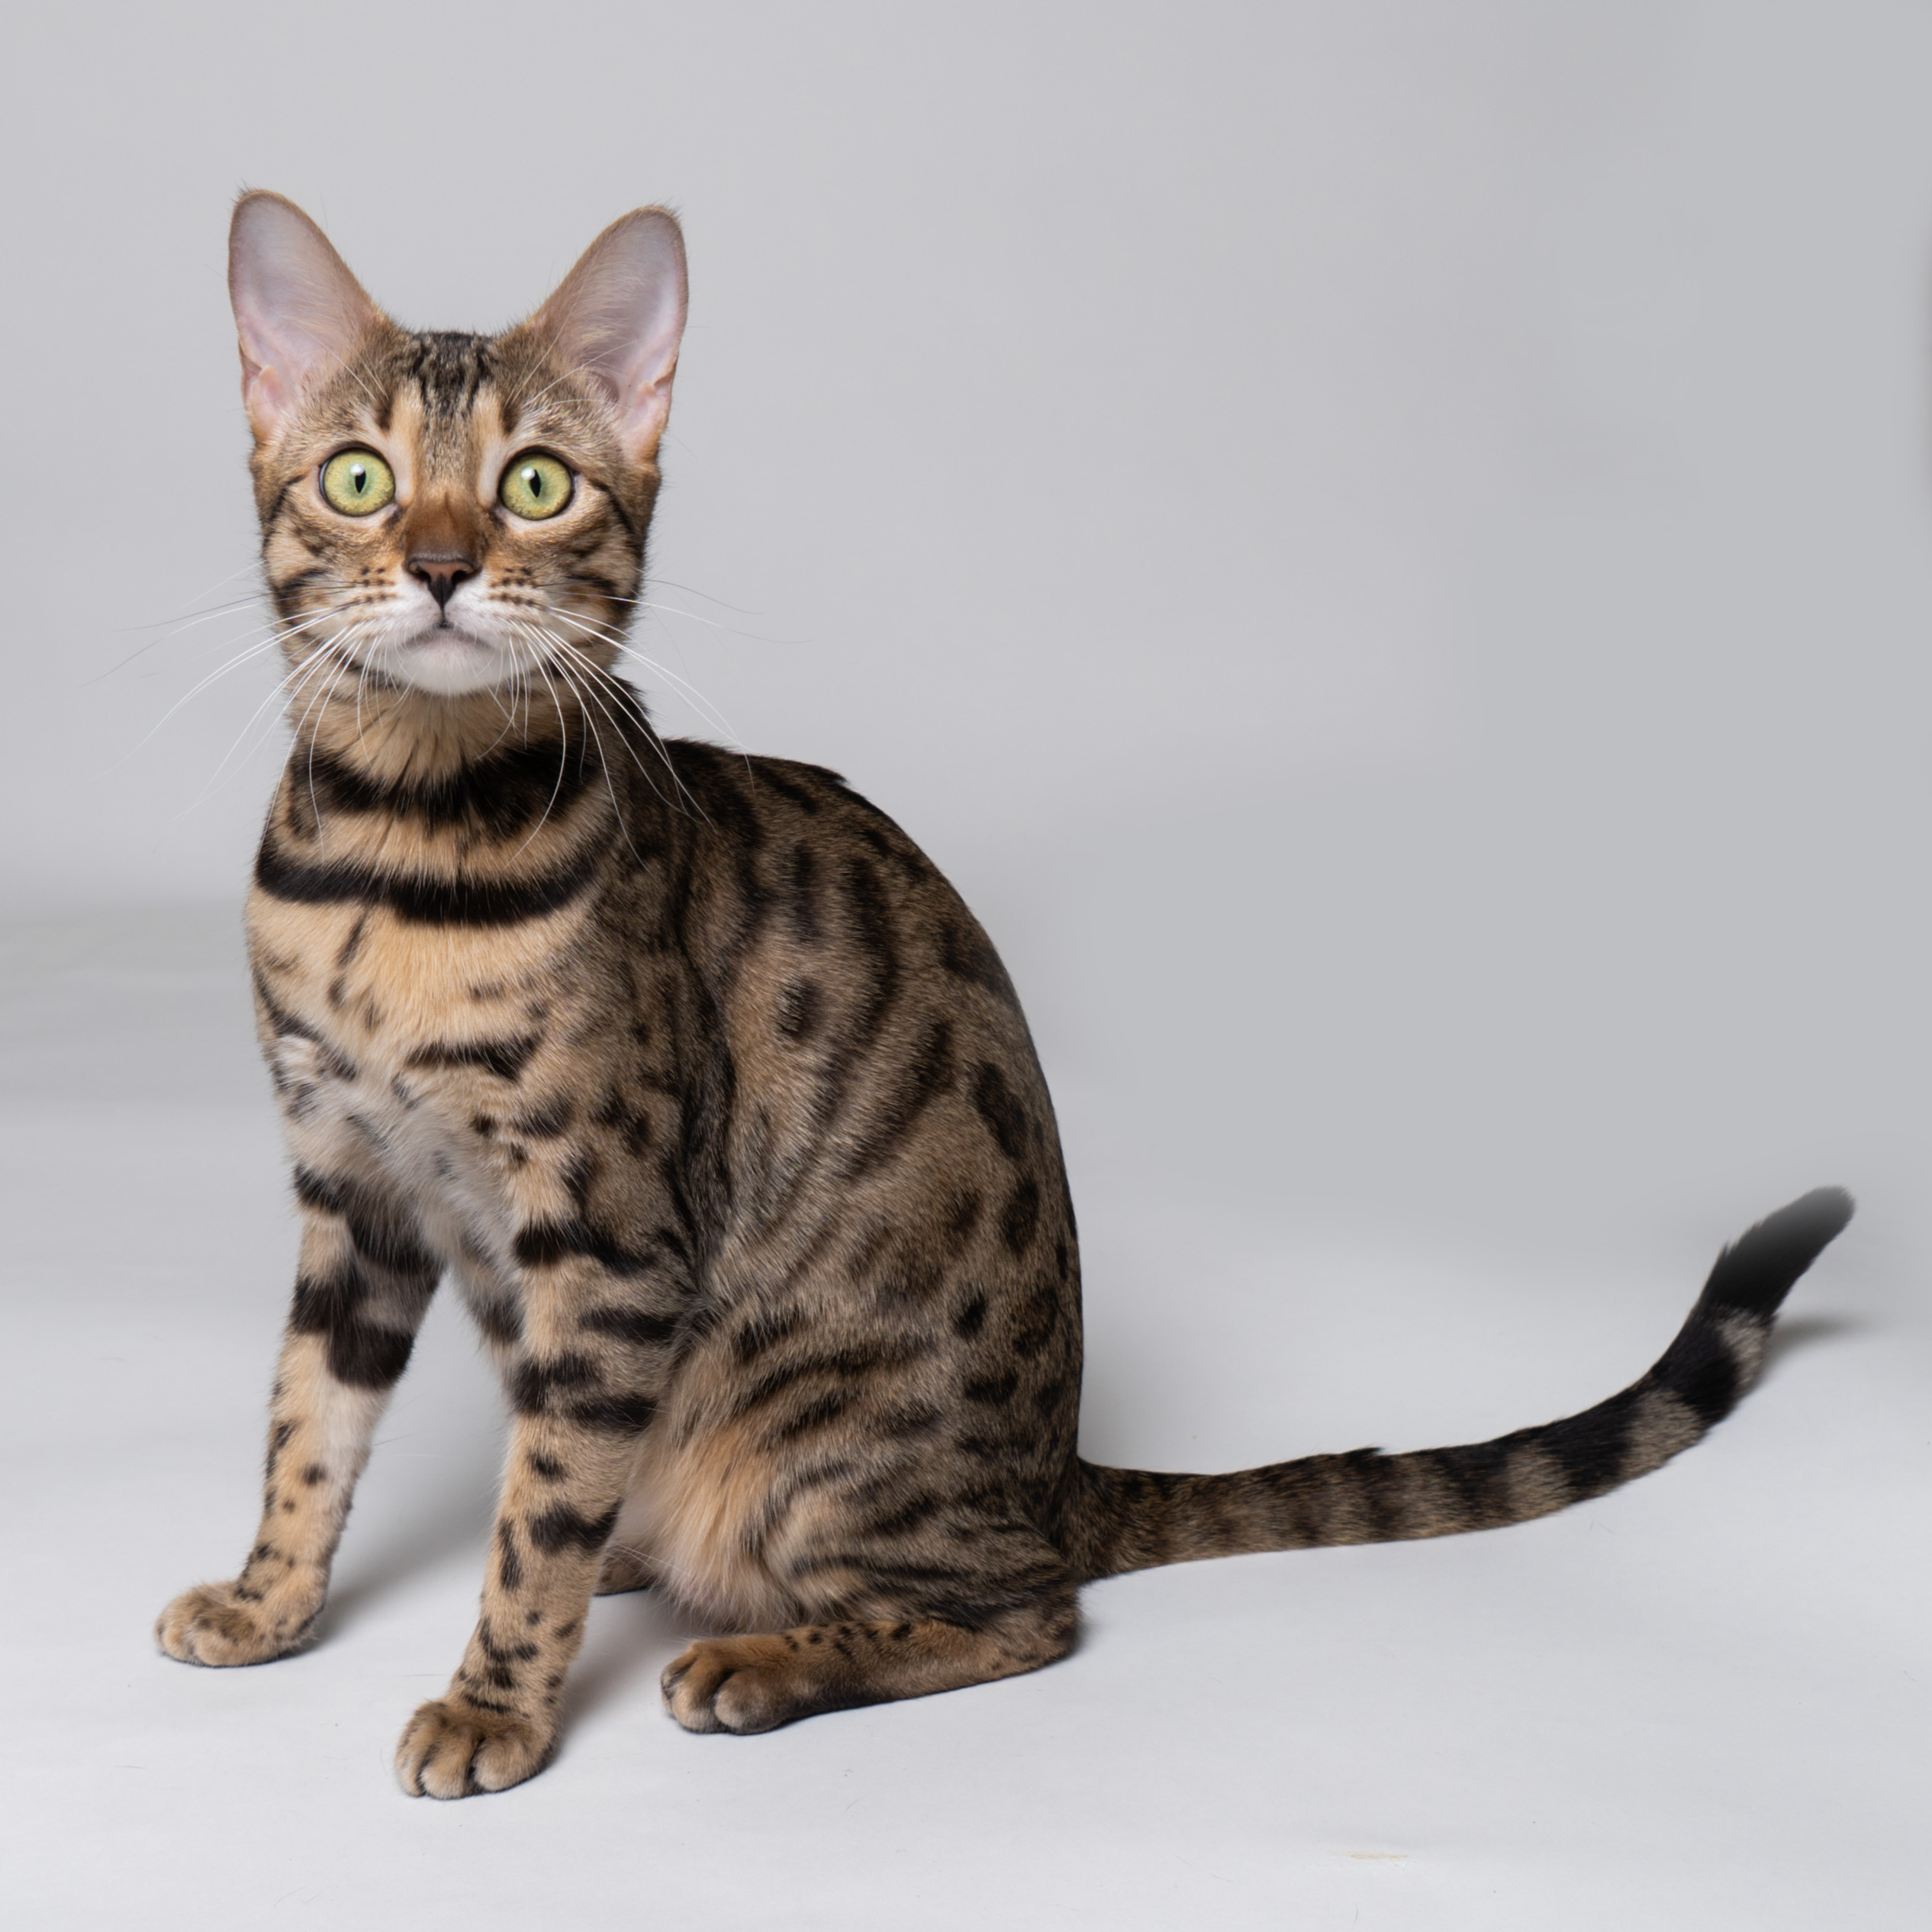 svartspotted bengal katt cat